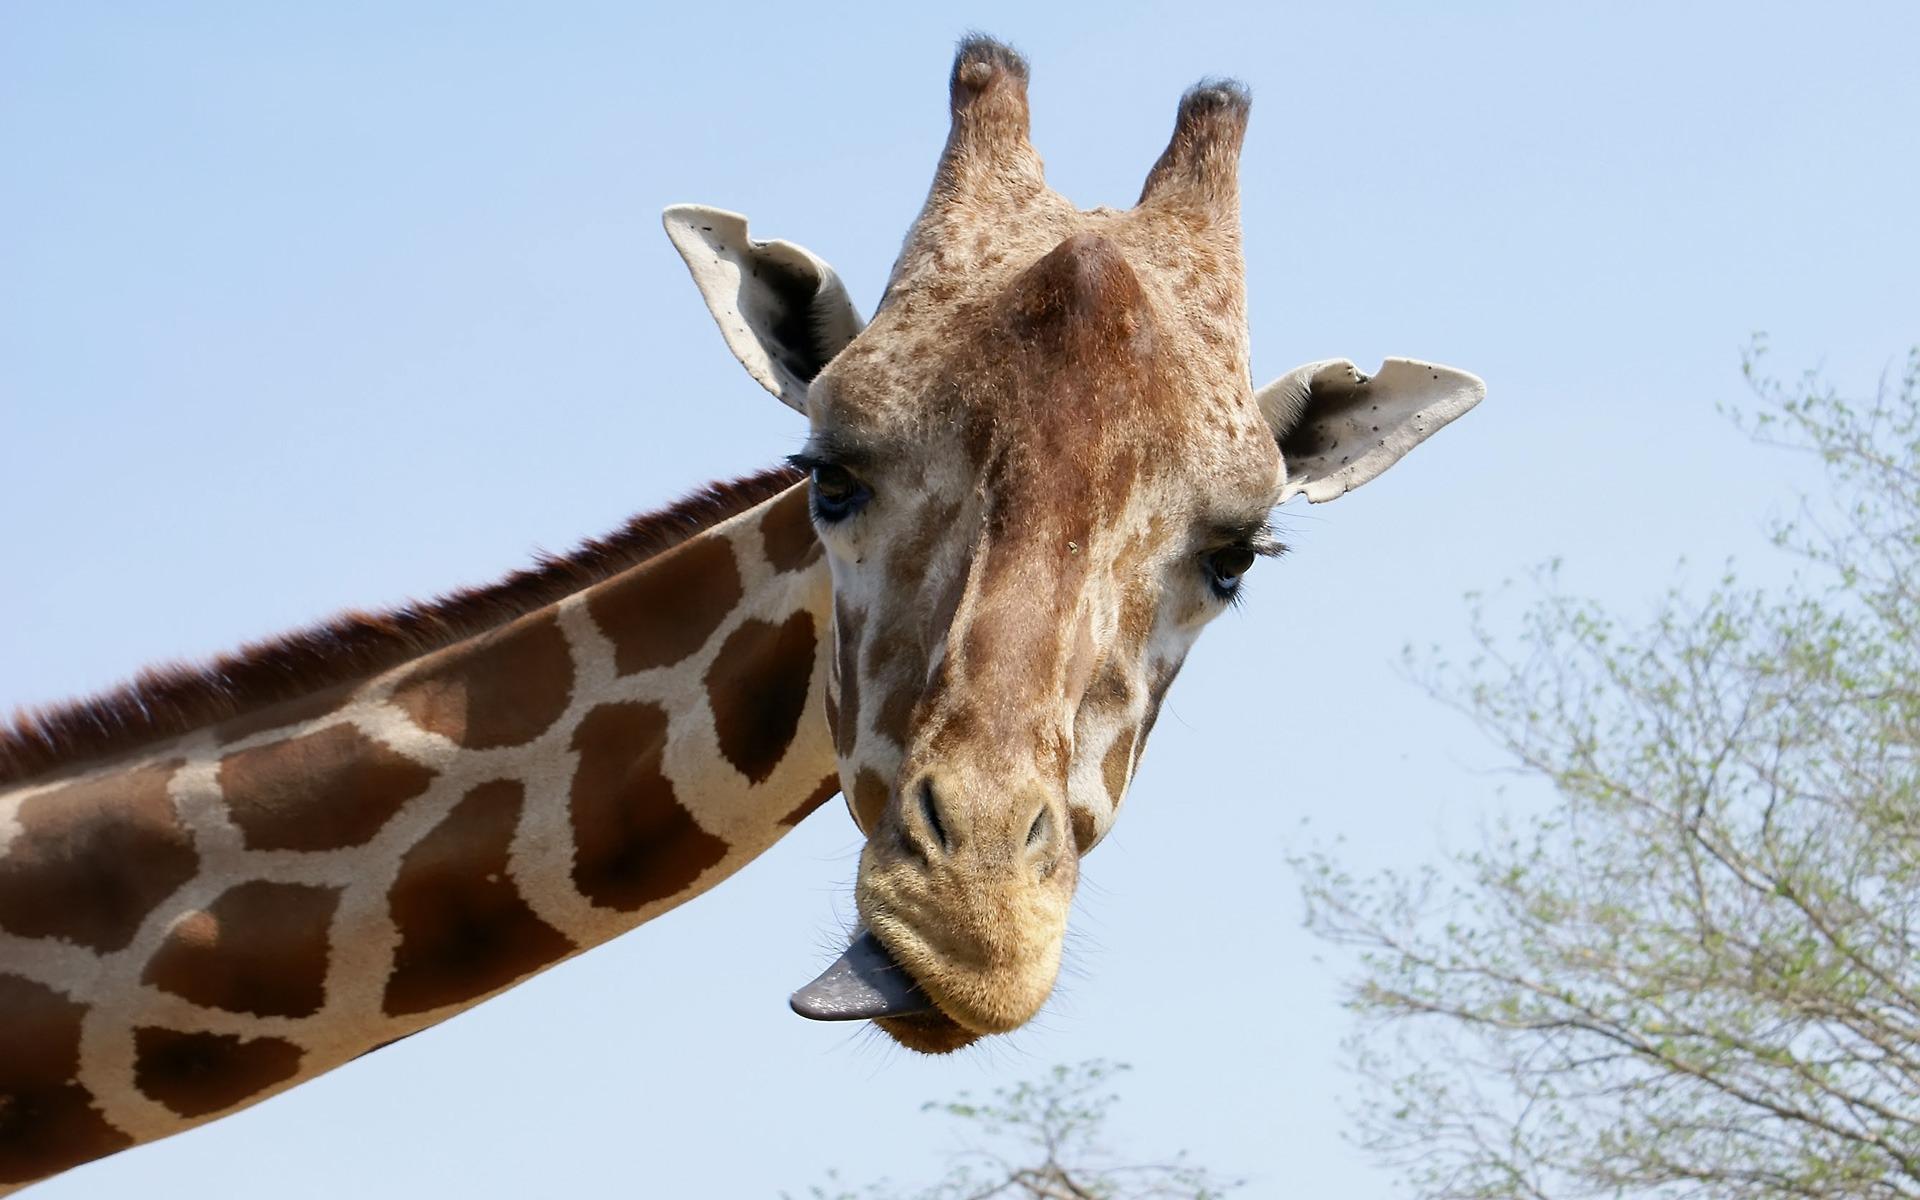 Giraffe tongue - photo#15